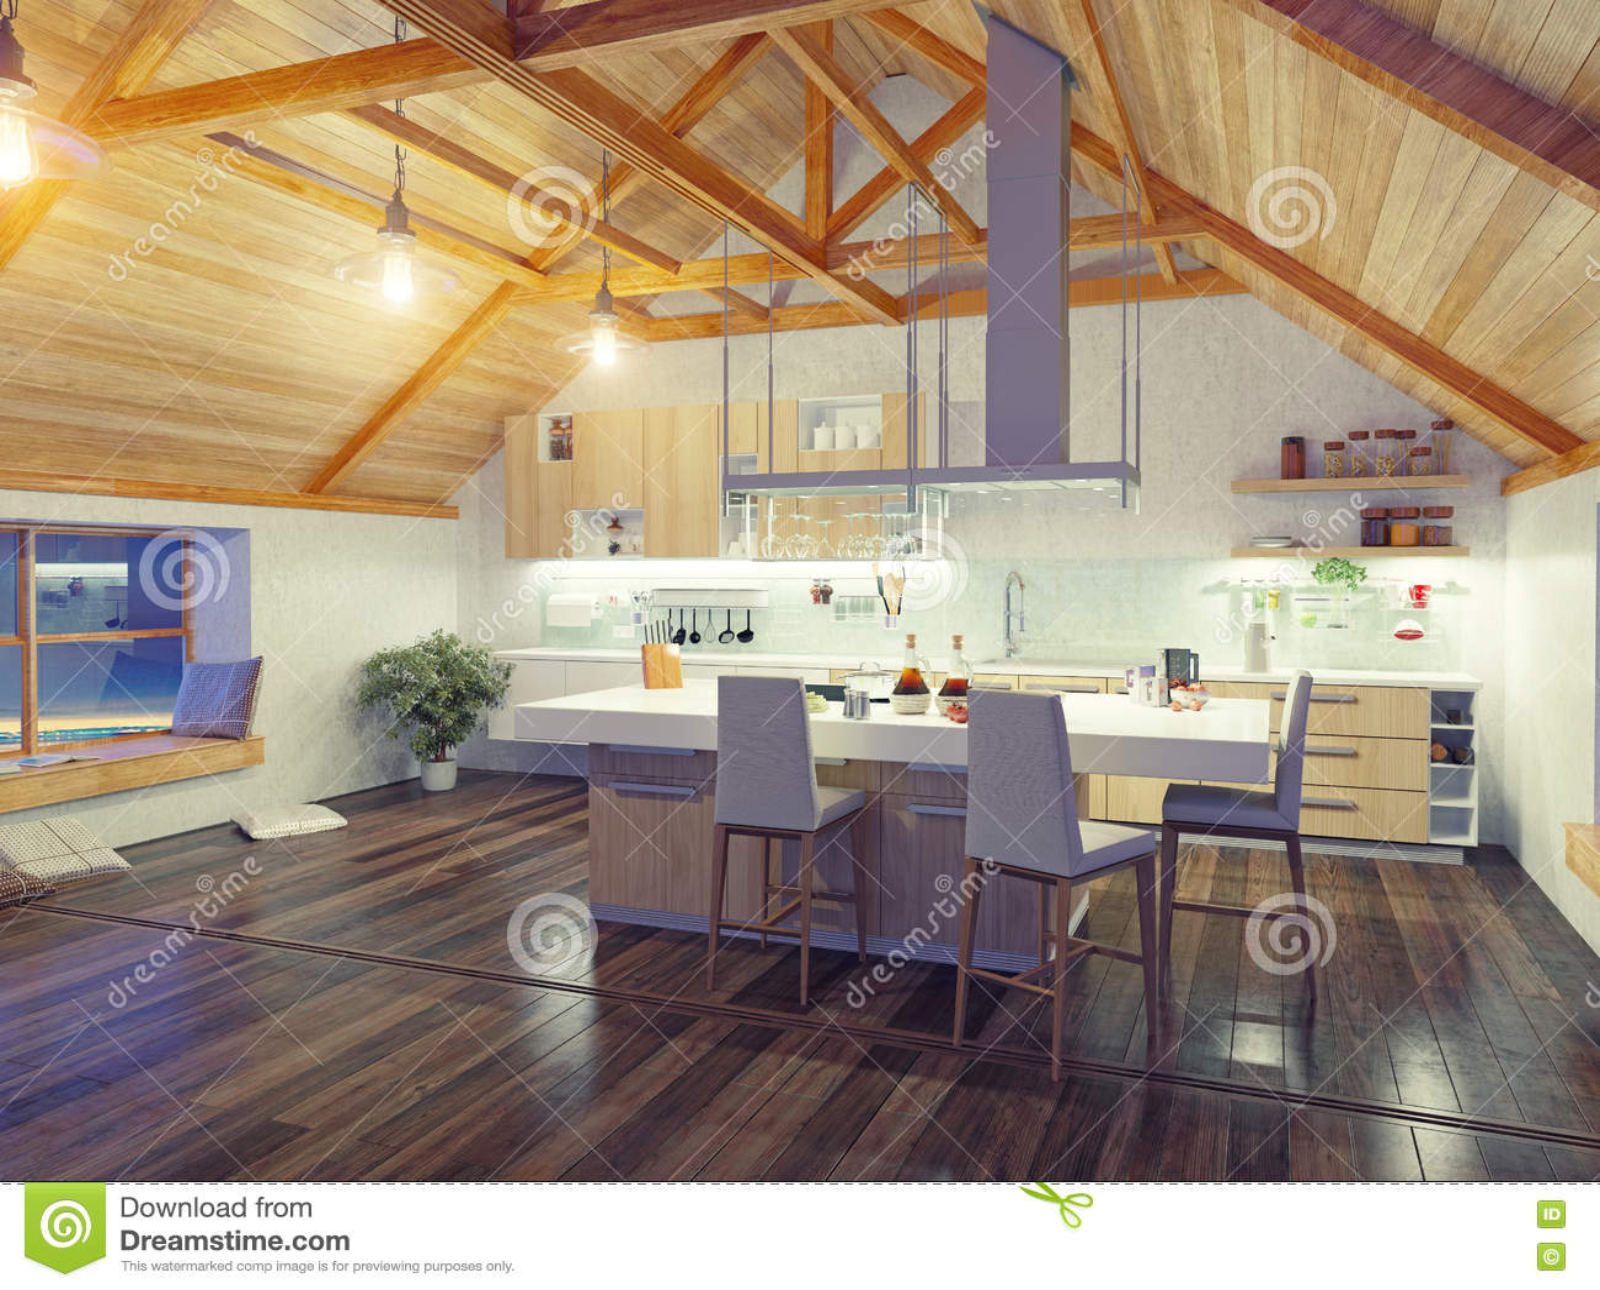 Attic modern kitchen interior stock illustration image for Attic kitchen designs